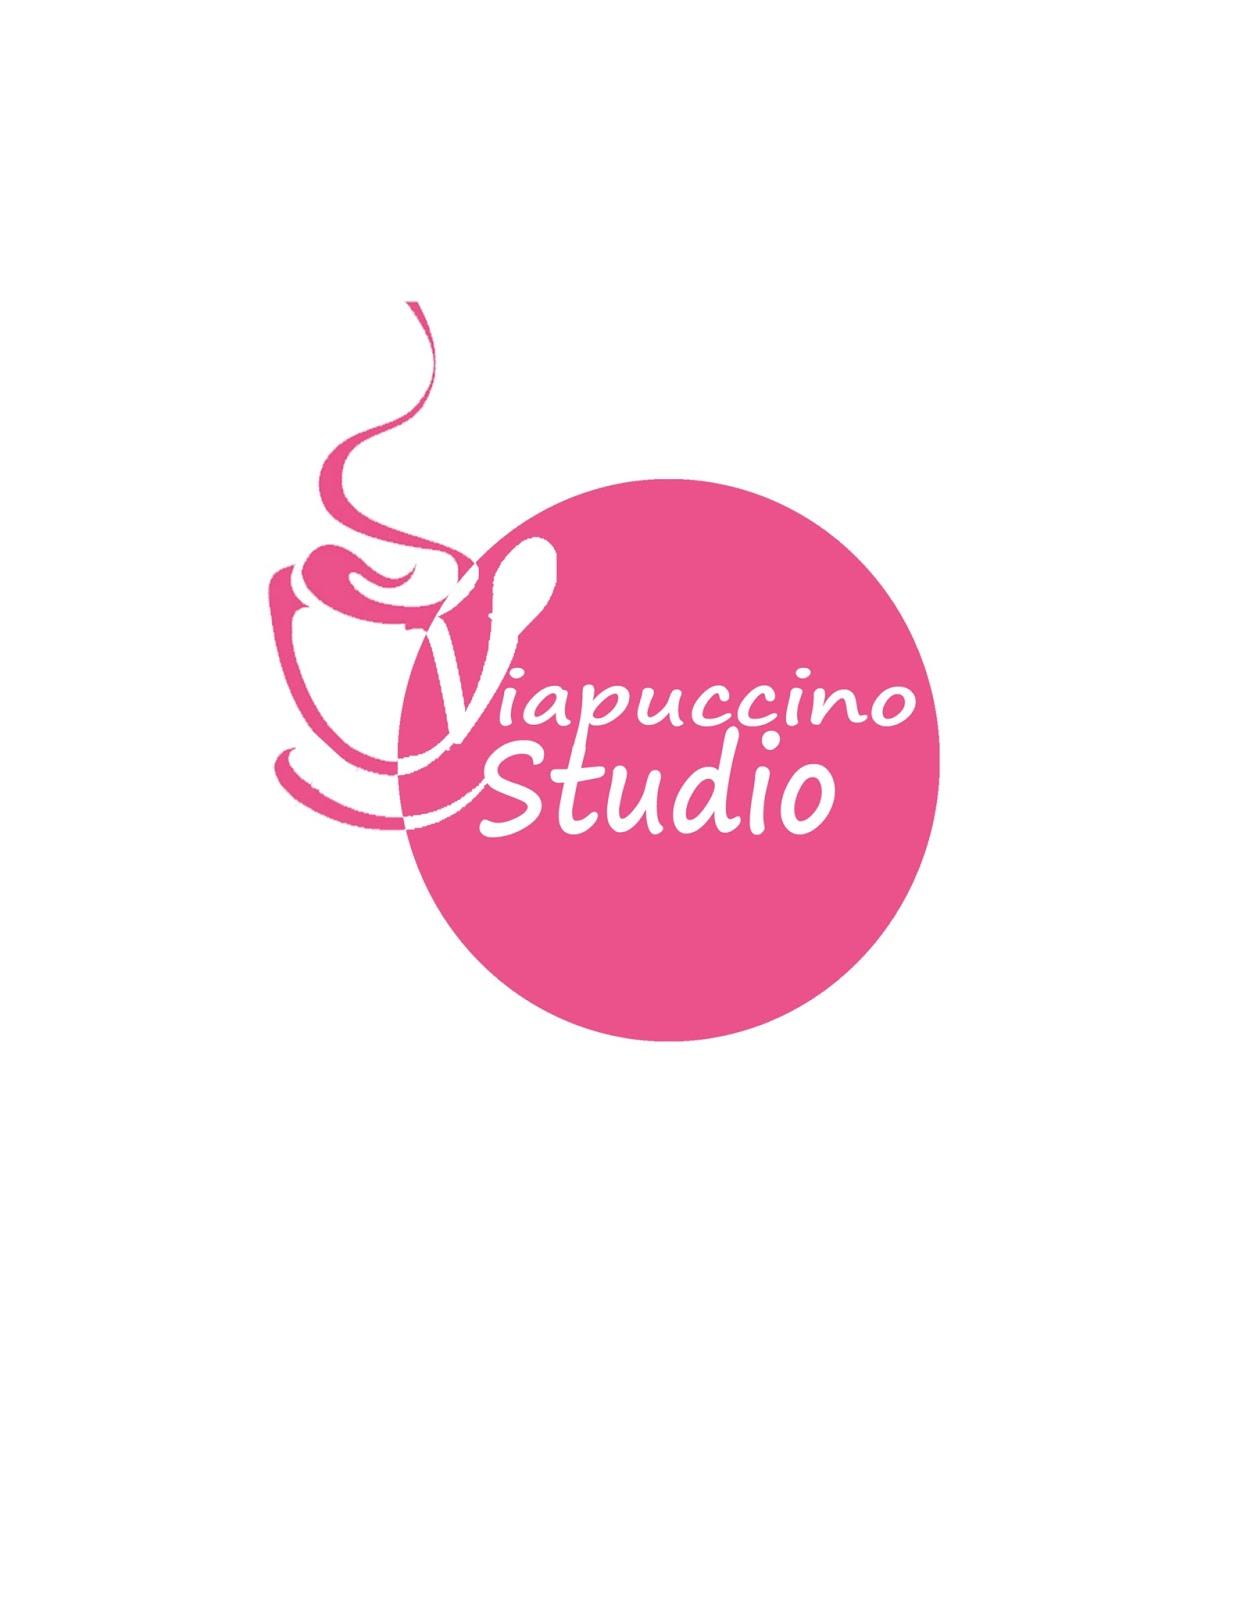 Viapuccino Studio